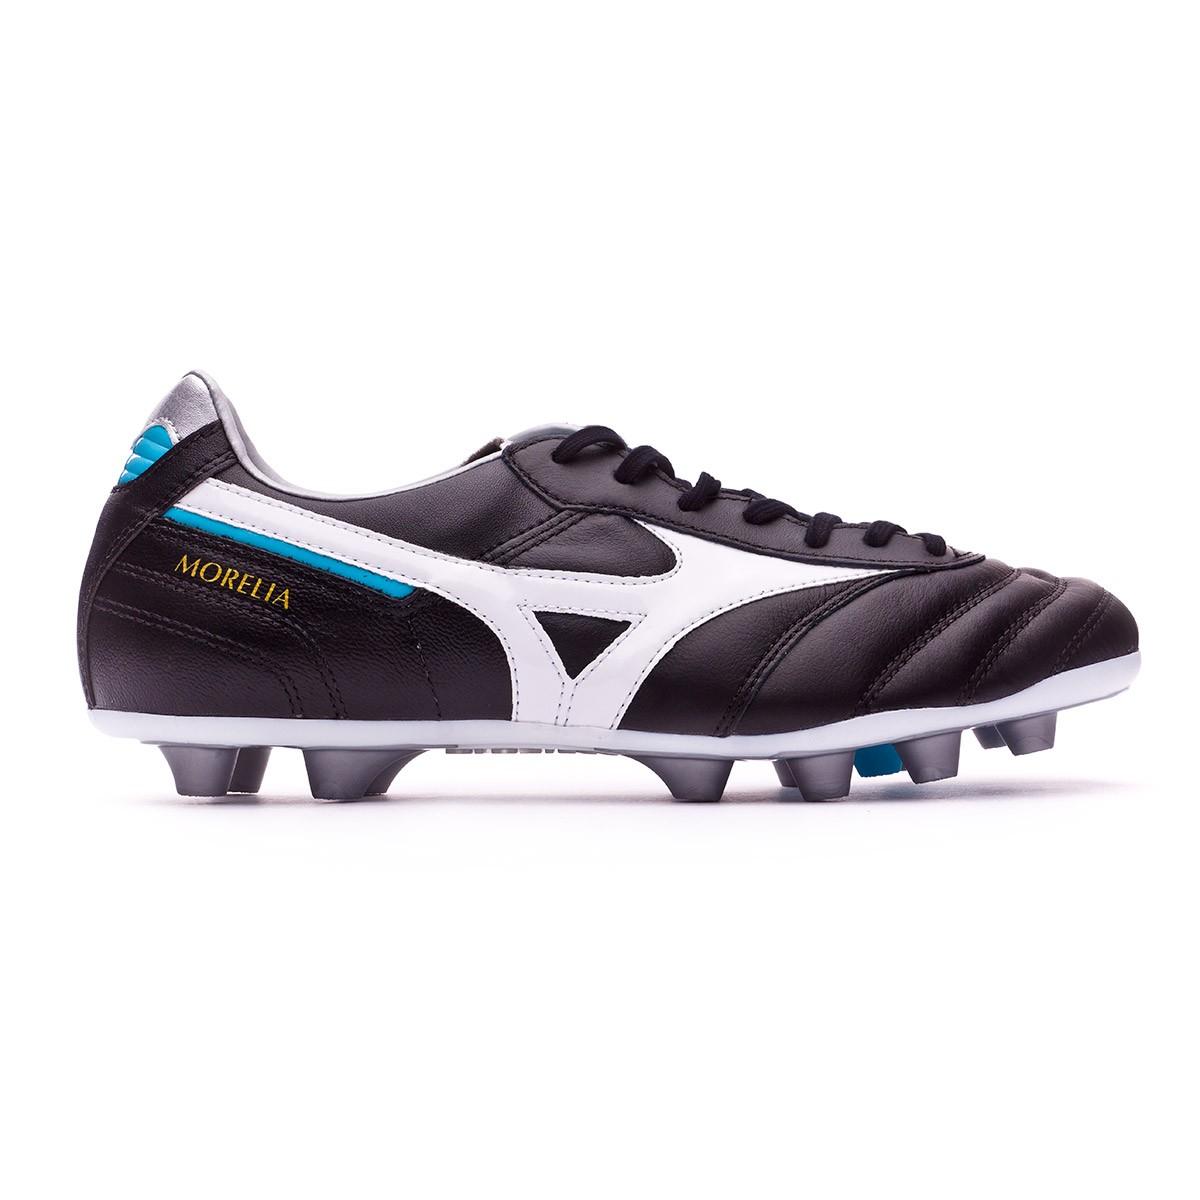 8ddcb444c6d78 Football Boots Mizuno Morelia II MD Black-White-Blue atomic - Tienda de  fútbol Fútbol Emotion